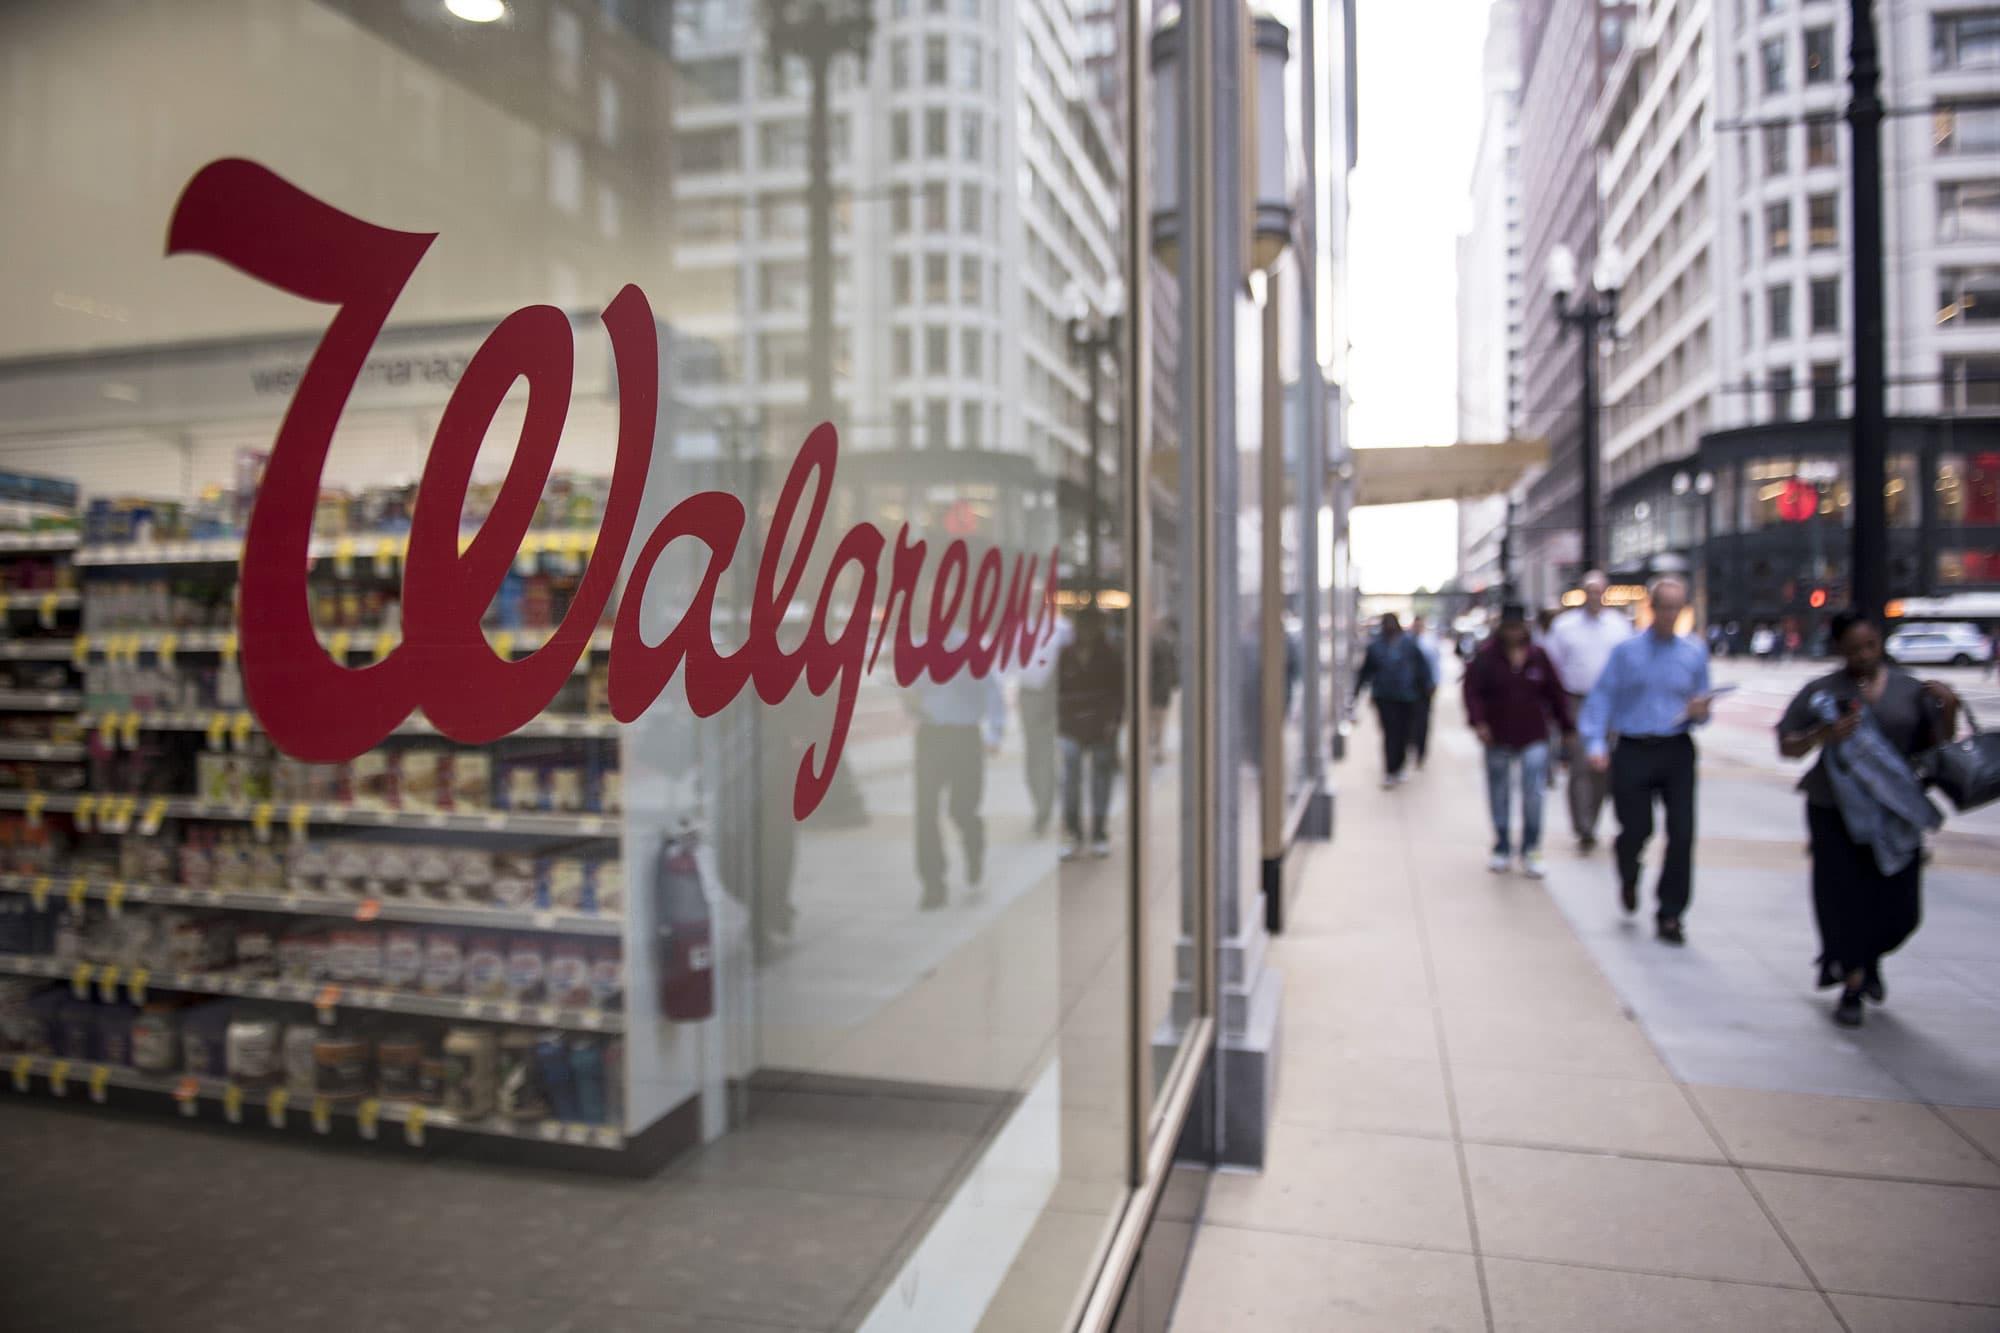 Walgreens Boots Alliance Q4 Earnings